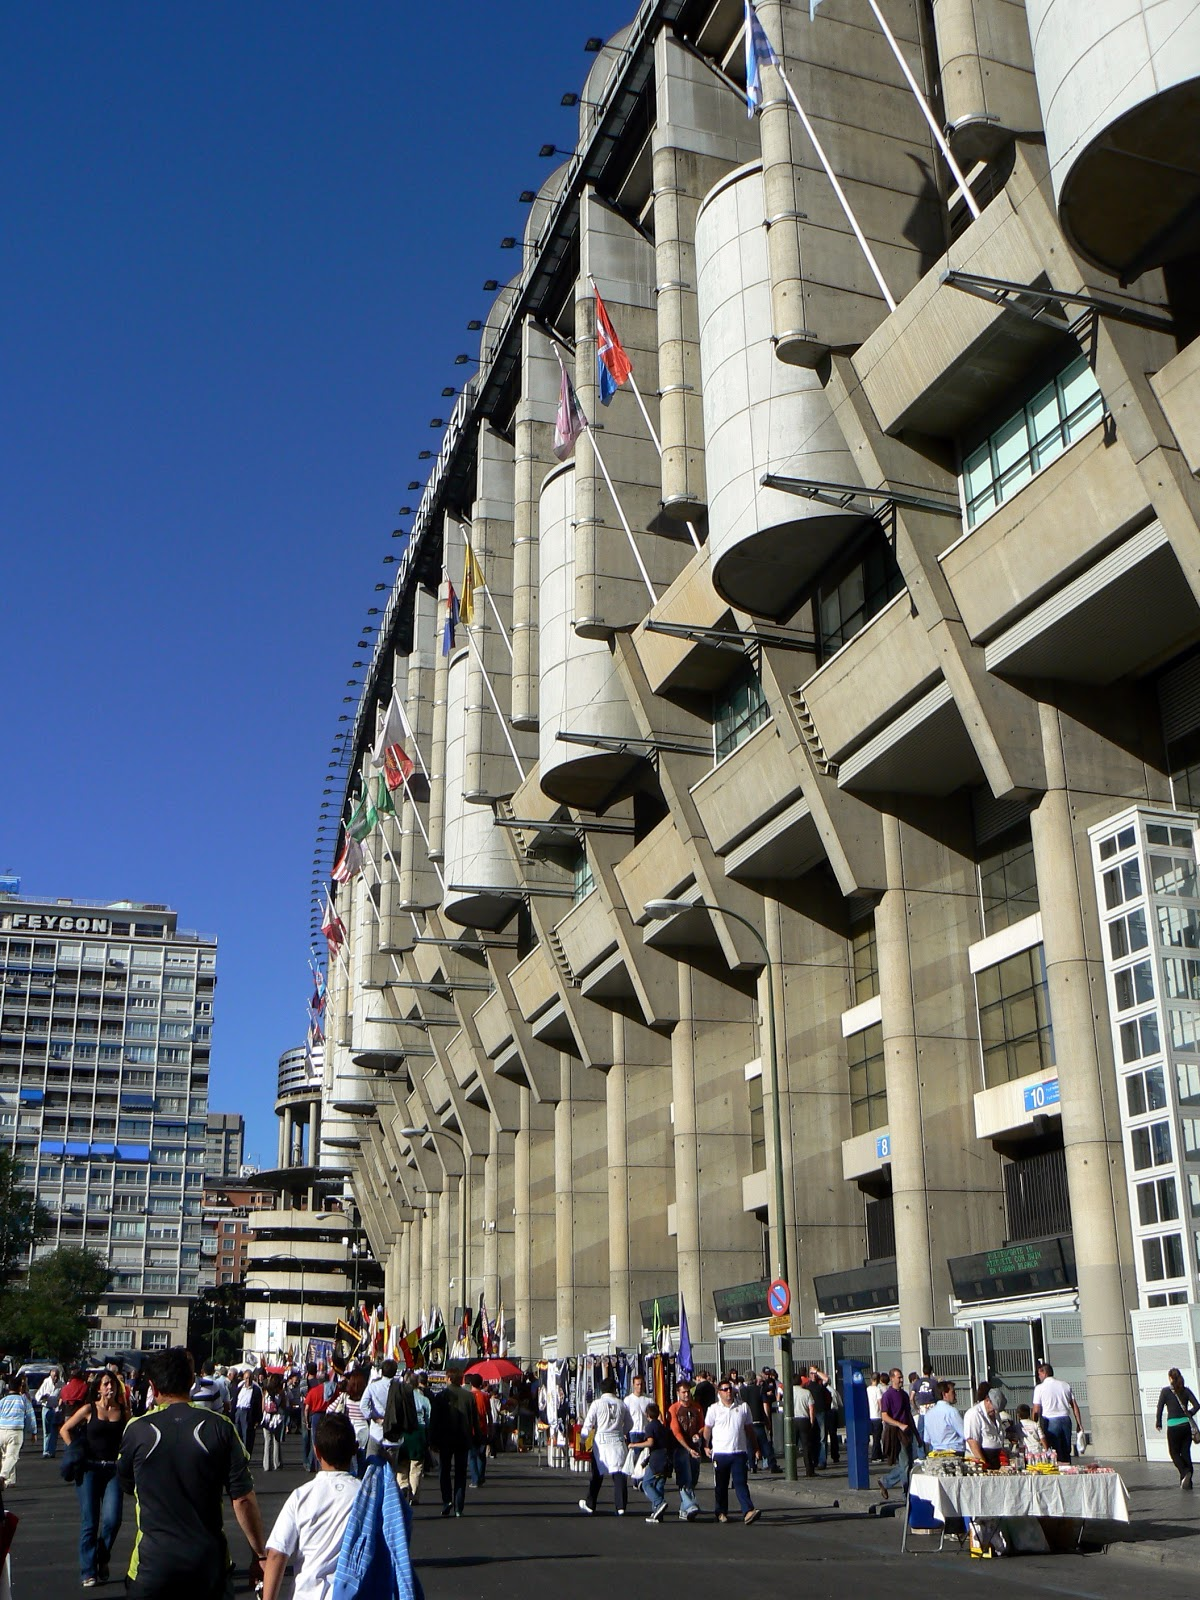 Que pe a madridista for Estadio bernabeu puerta 0